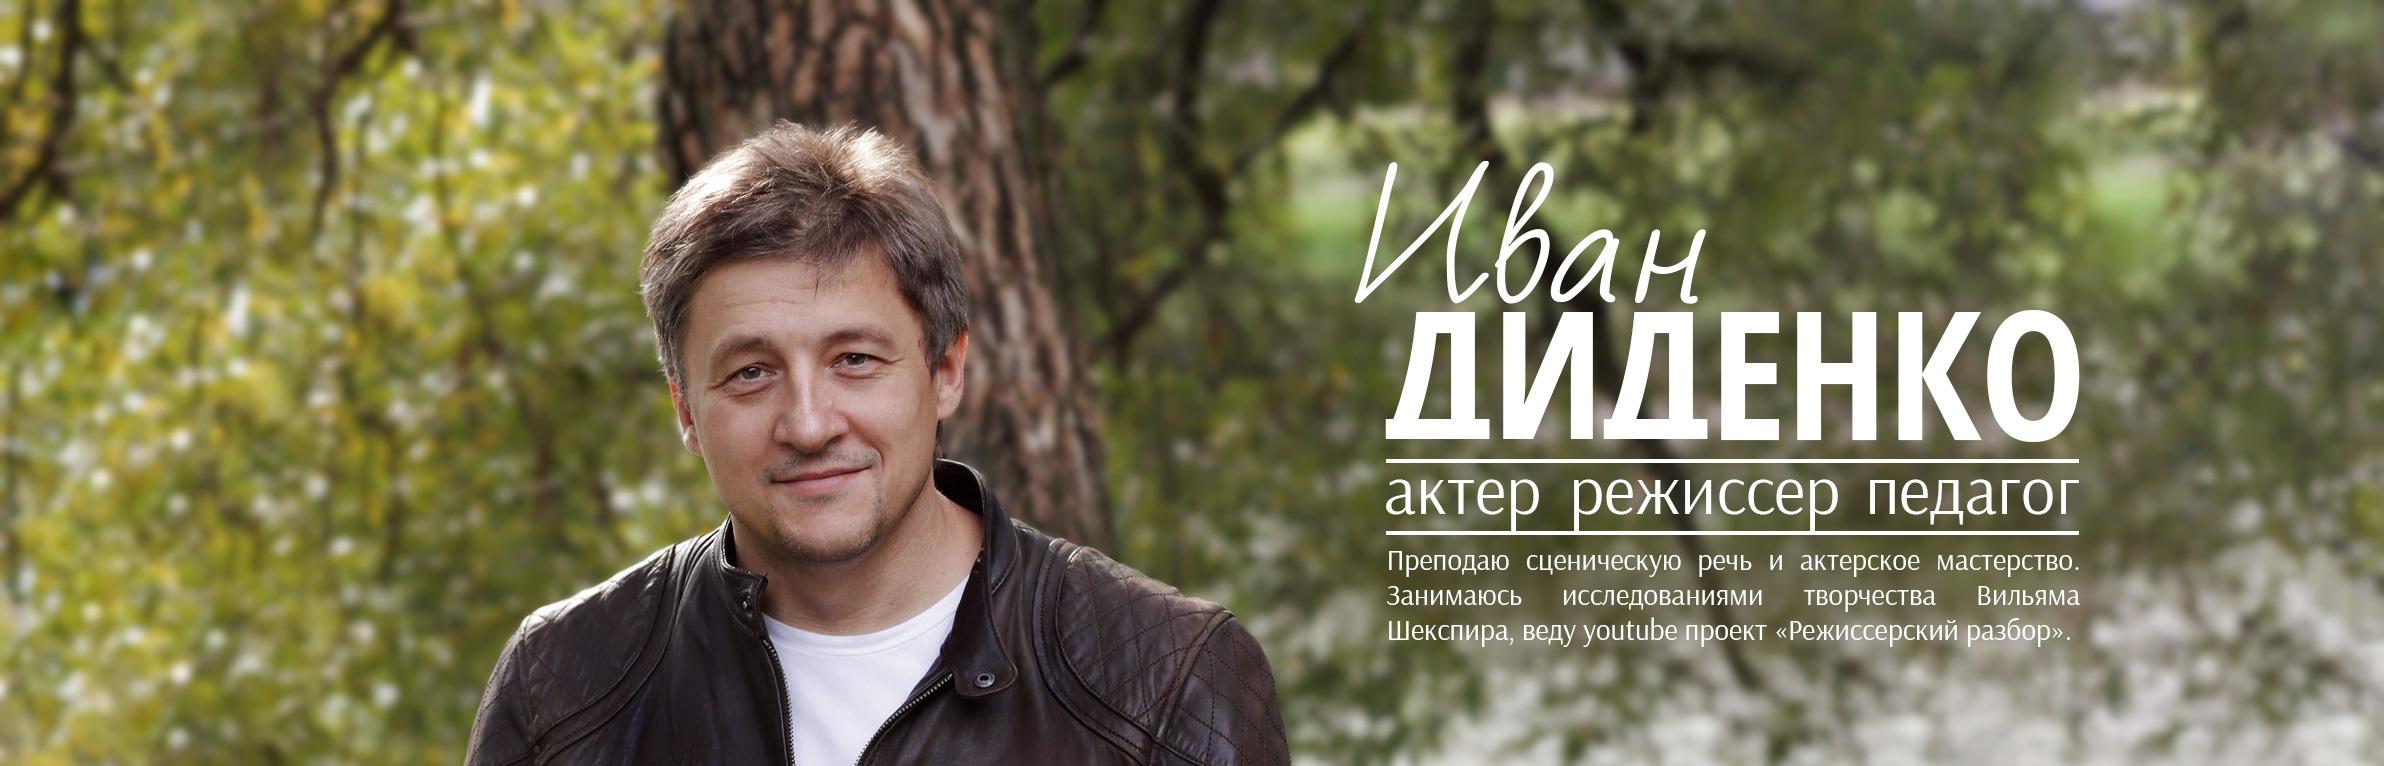 Иван Диденко — актер, режиссер, педагог